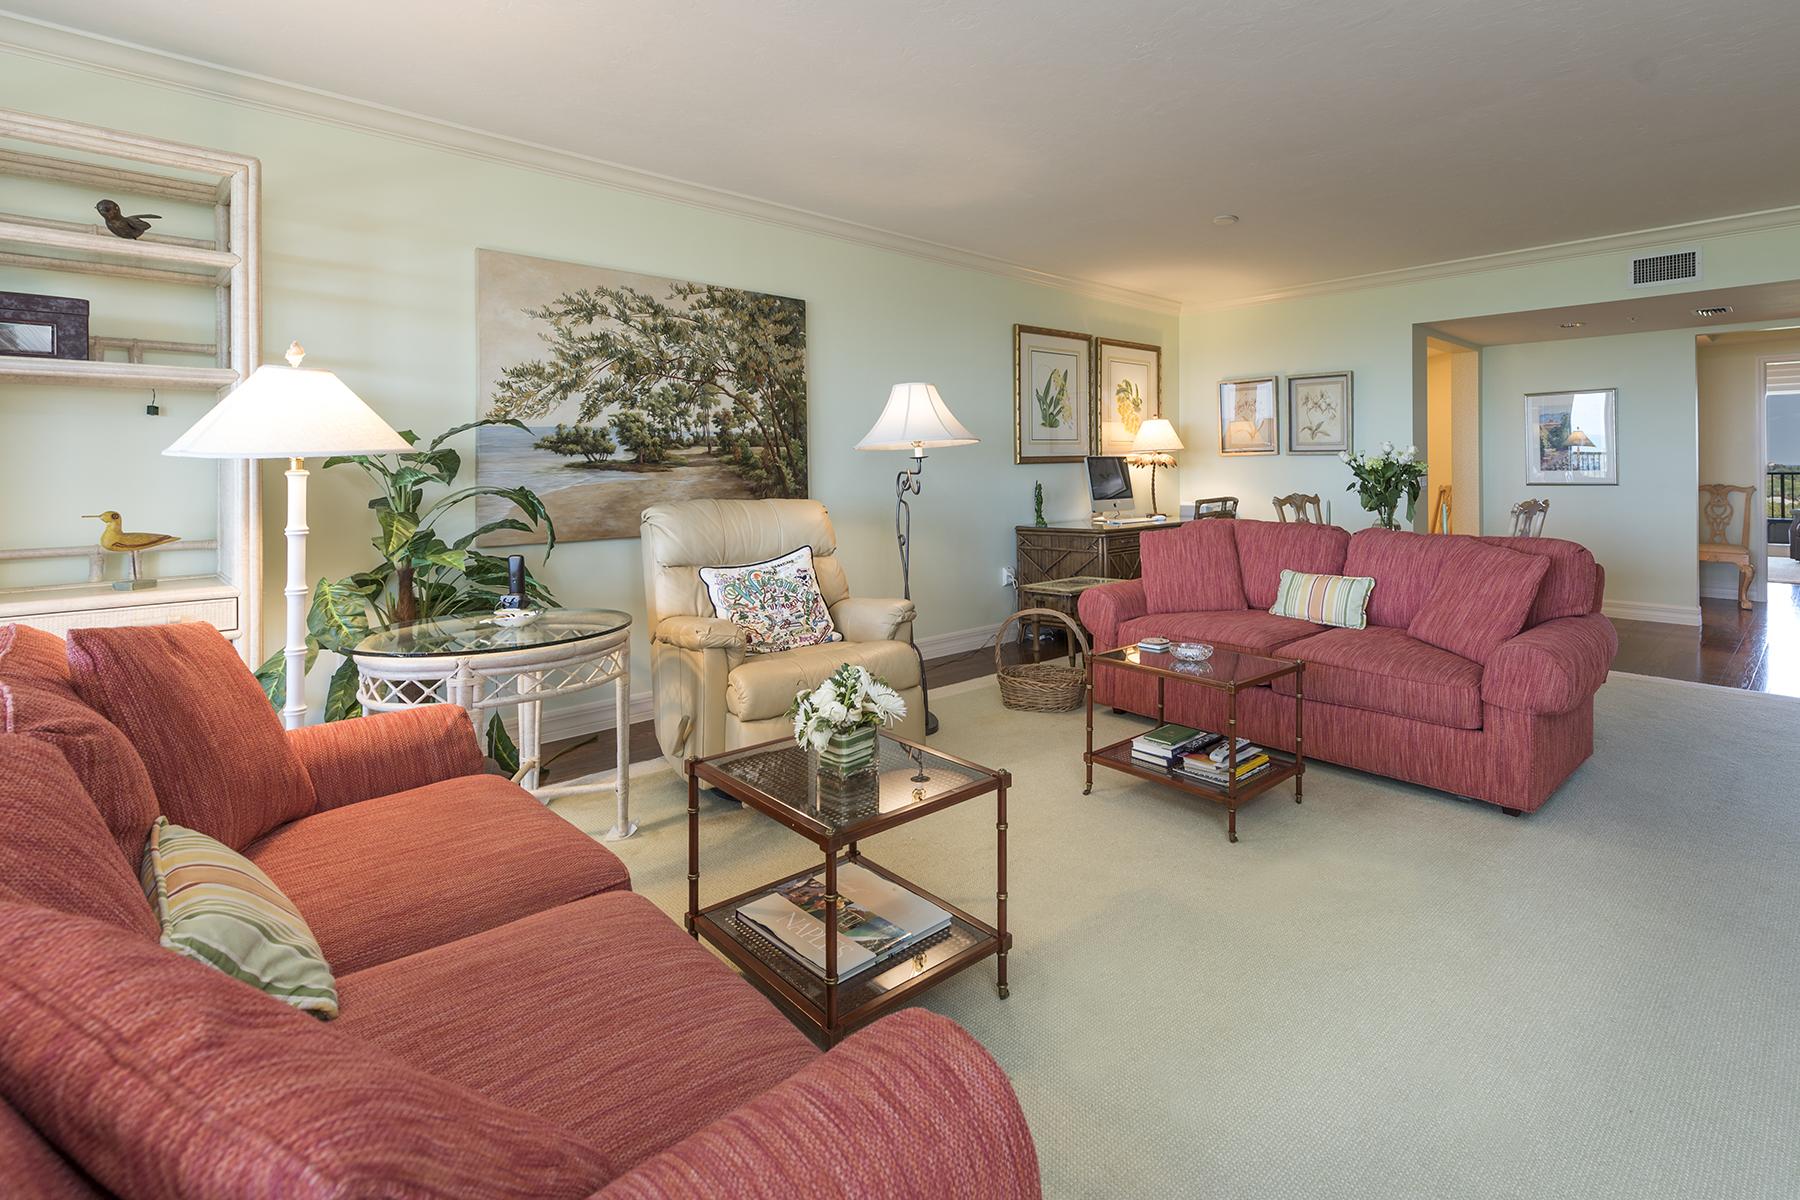 Condominium for Sale at PELICAN BAY - MARBELLA 7425 Pelican Bay Blvd 1004, Naples, Florida 34108 United States